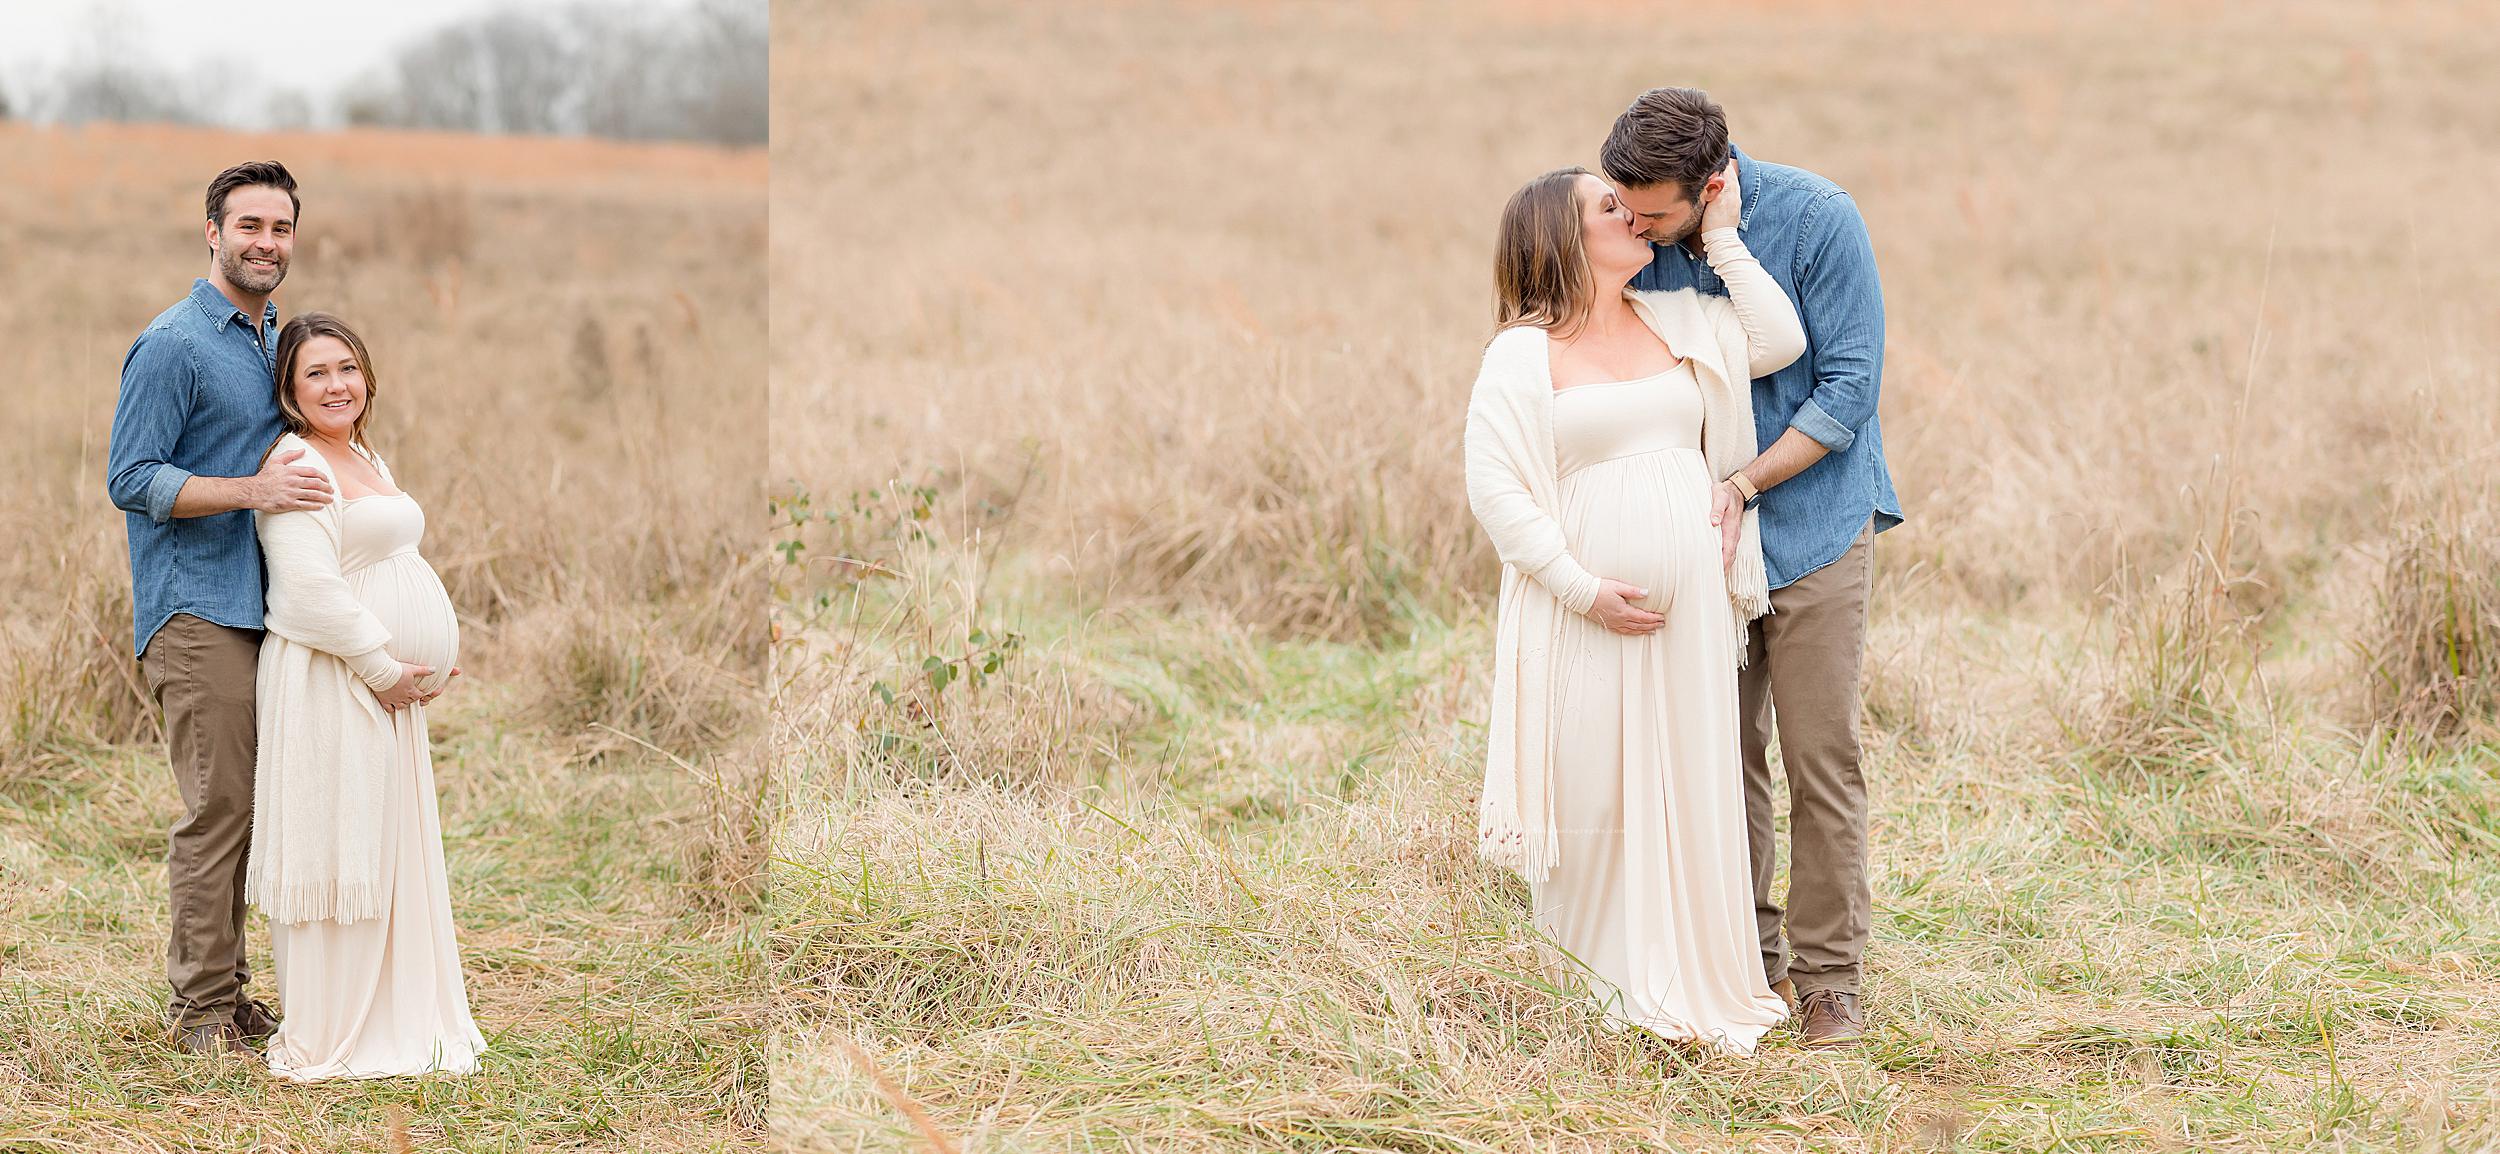 atlanta-cumming-brookhaven-alpharetta-virginia-highlands-roswell-decatur-lily-sophia-photography-outdoor-field-sunset-couples-maternity-photos_0694.jpg